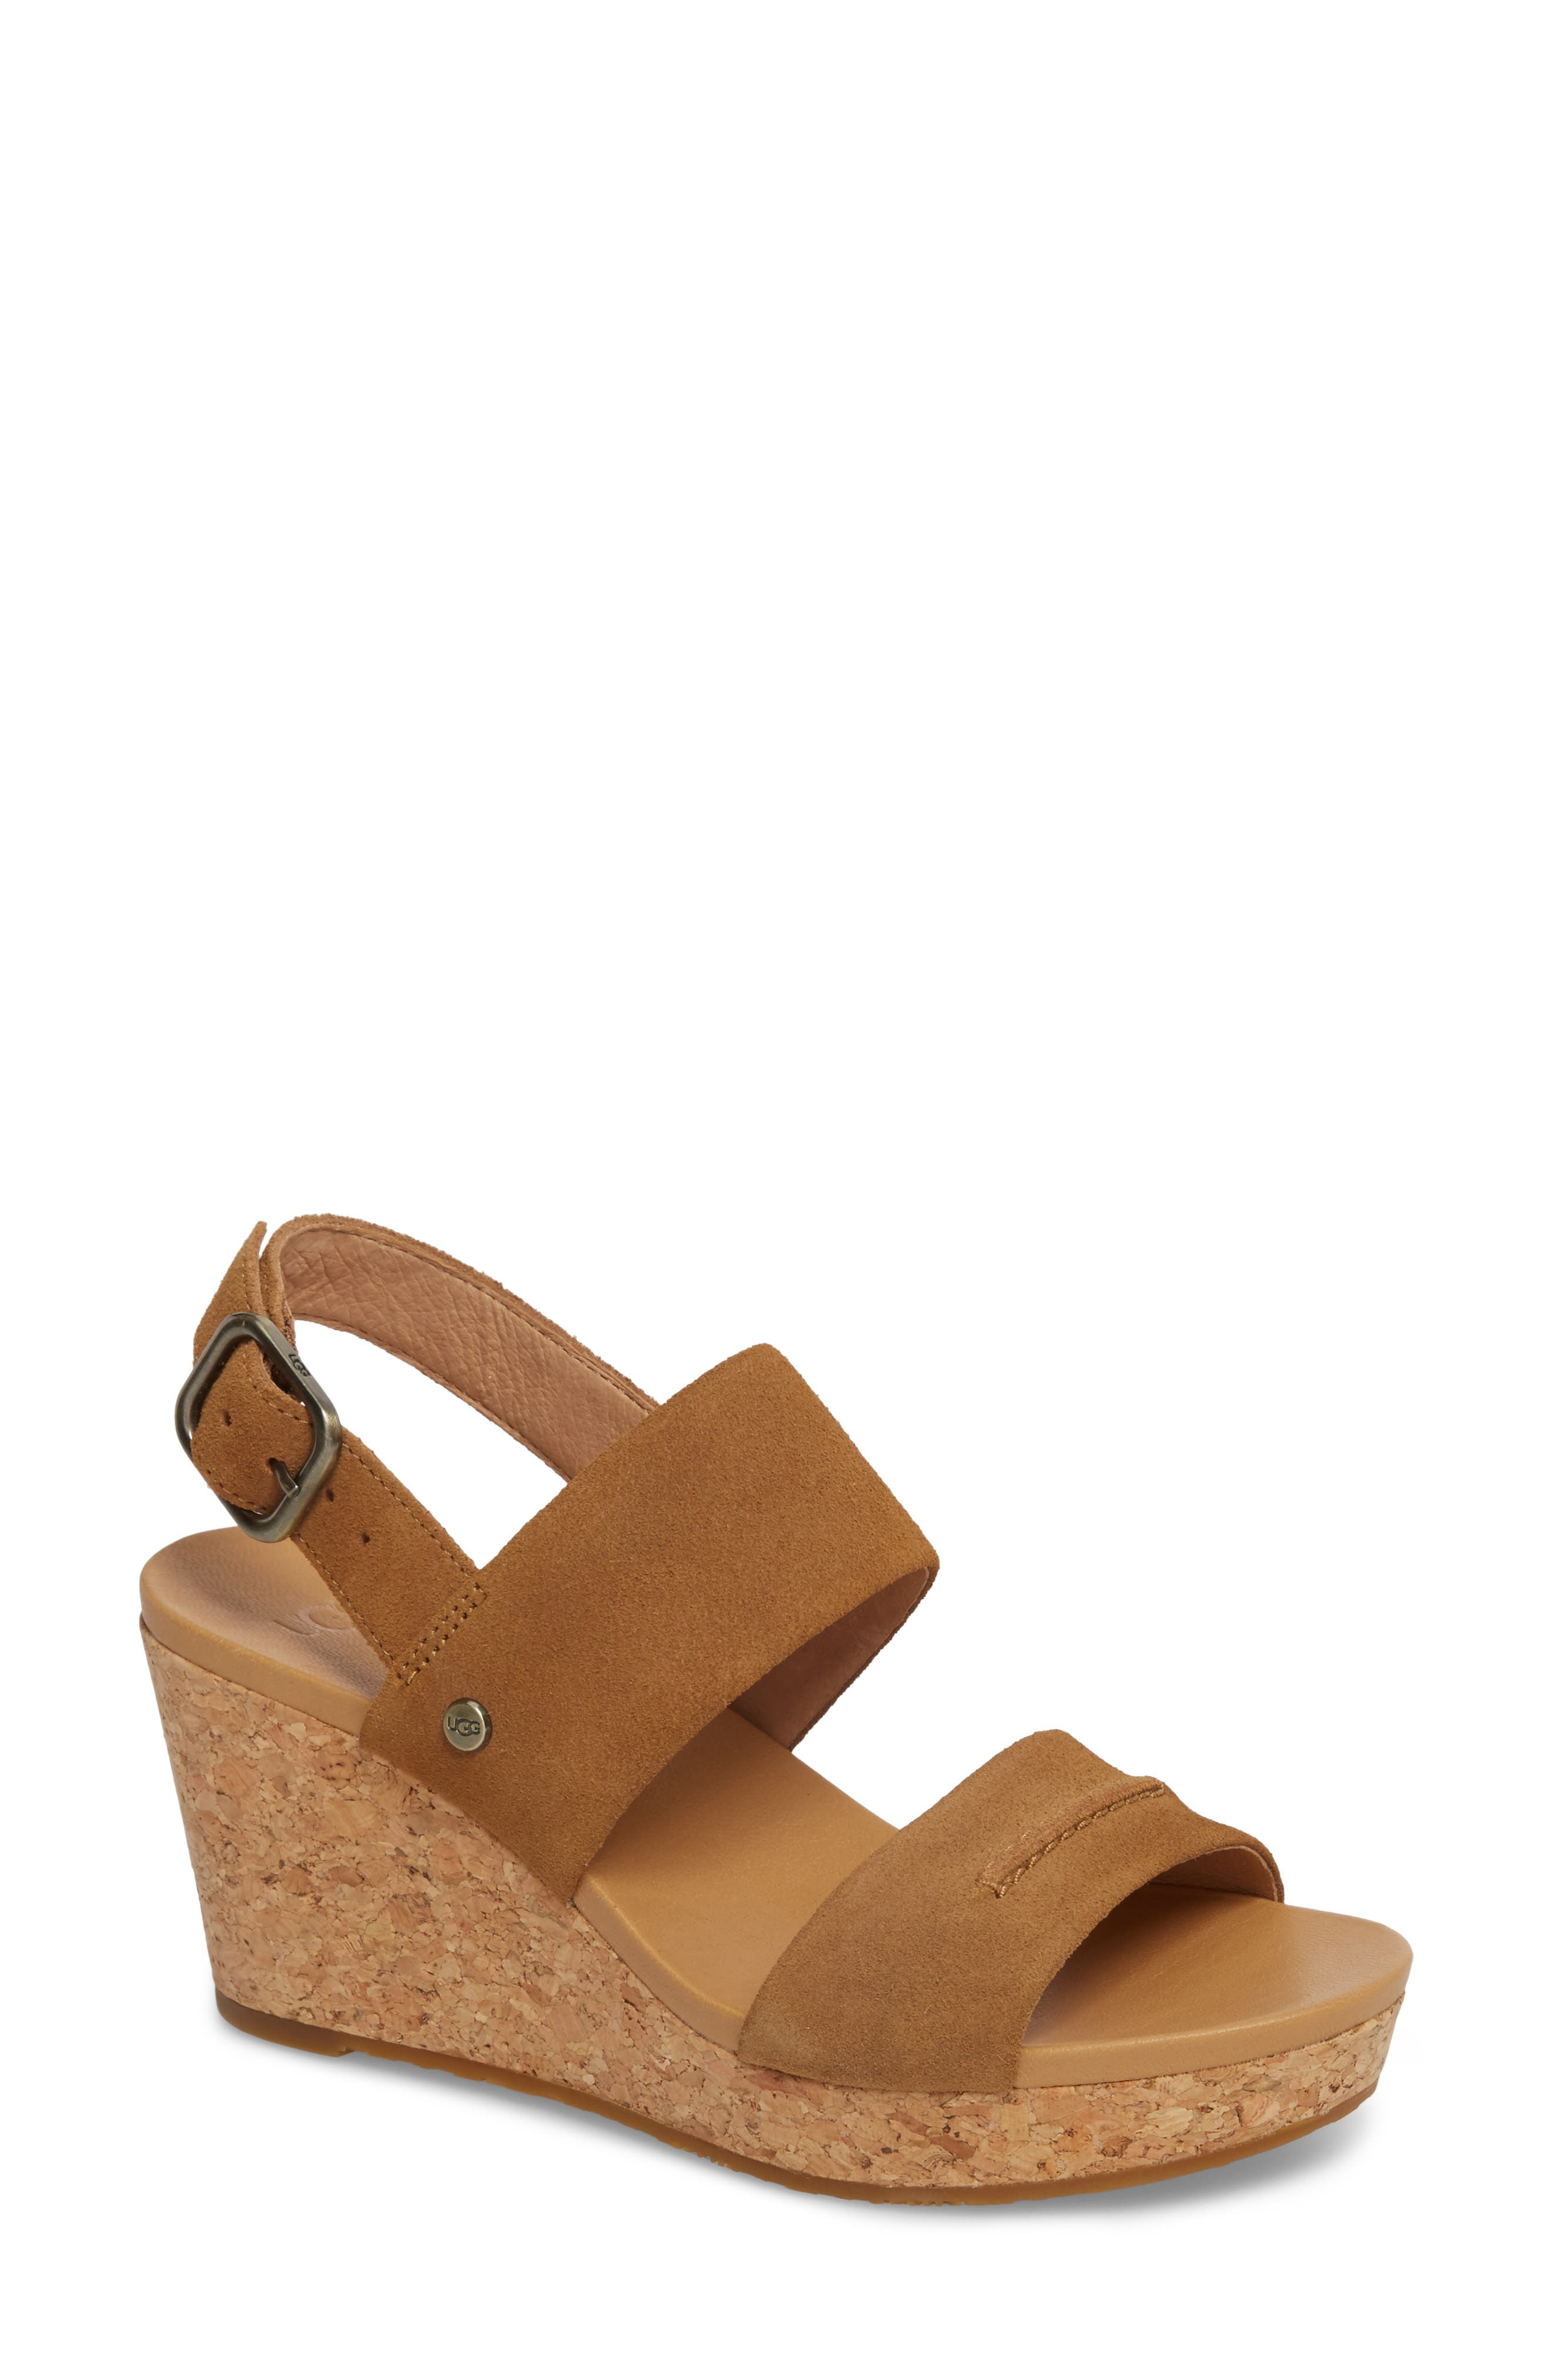 main pin comfortable image comforter wedge calypso women shoes comfort sandals vionic sandal